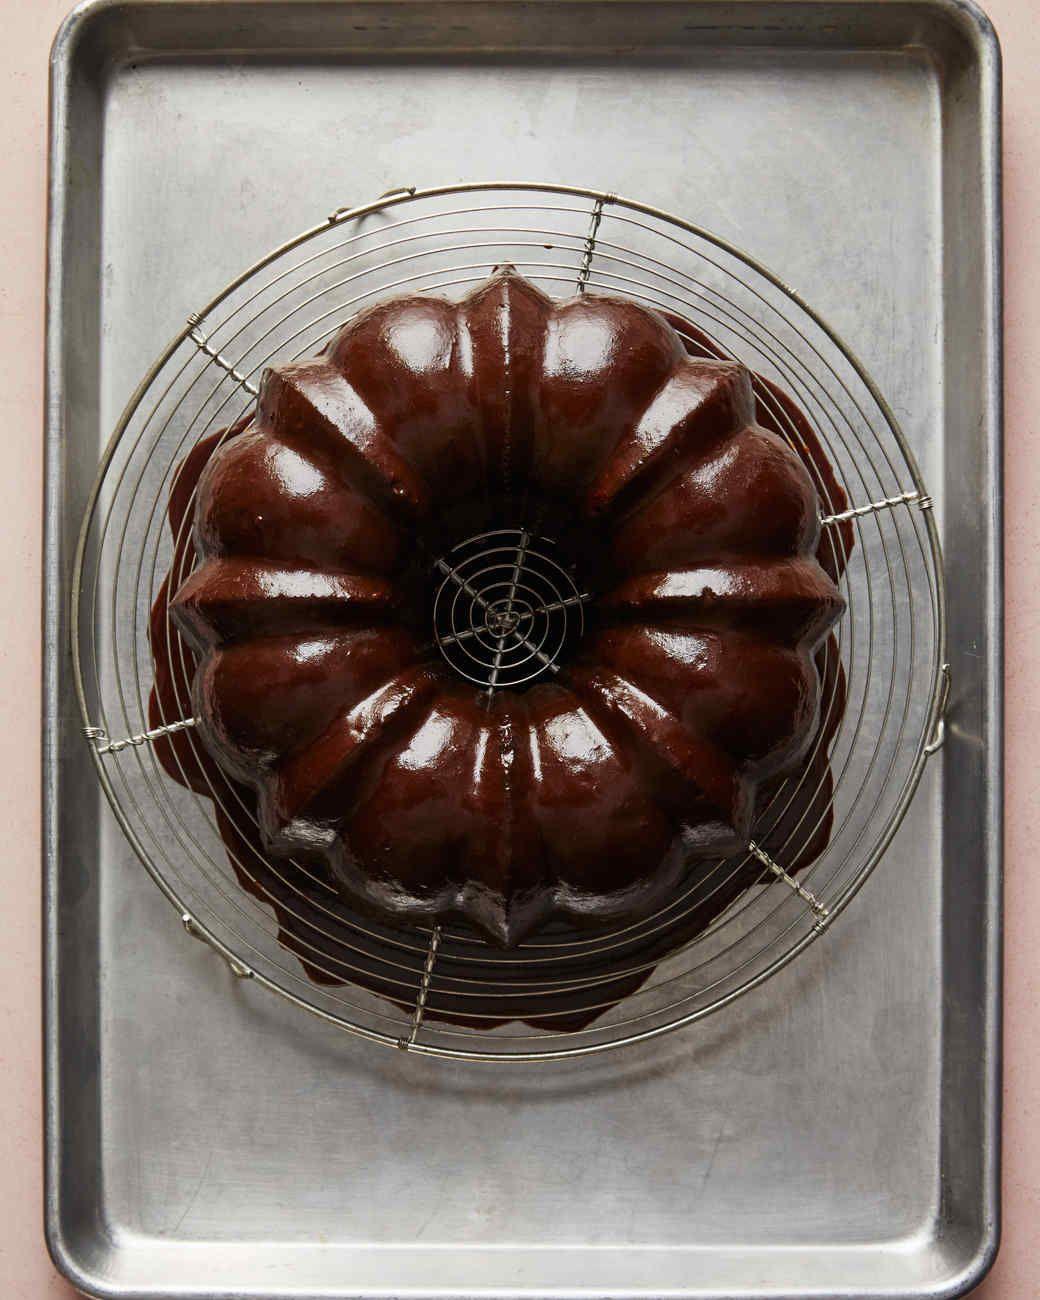 Chocolate Date Pudding Cake Recipe Got Chocolate Cake 2